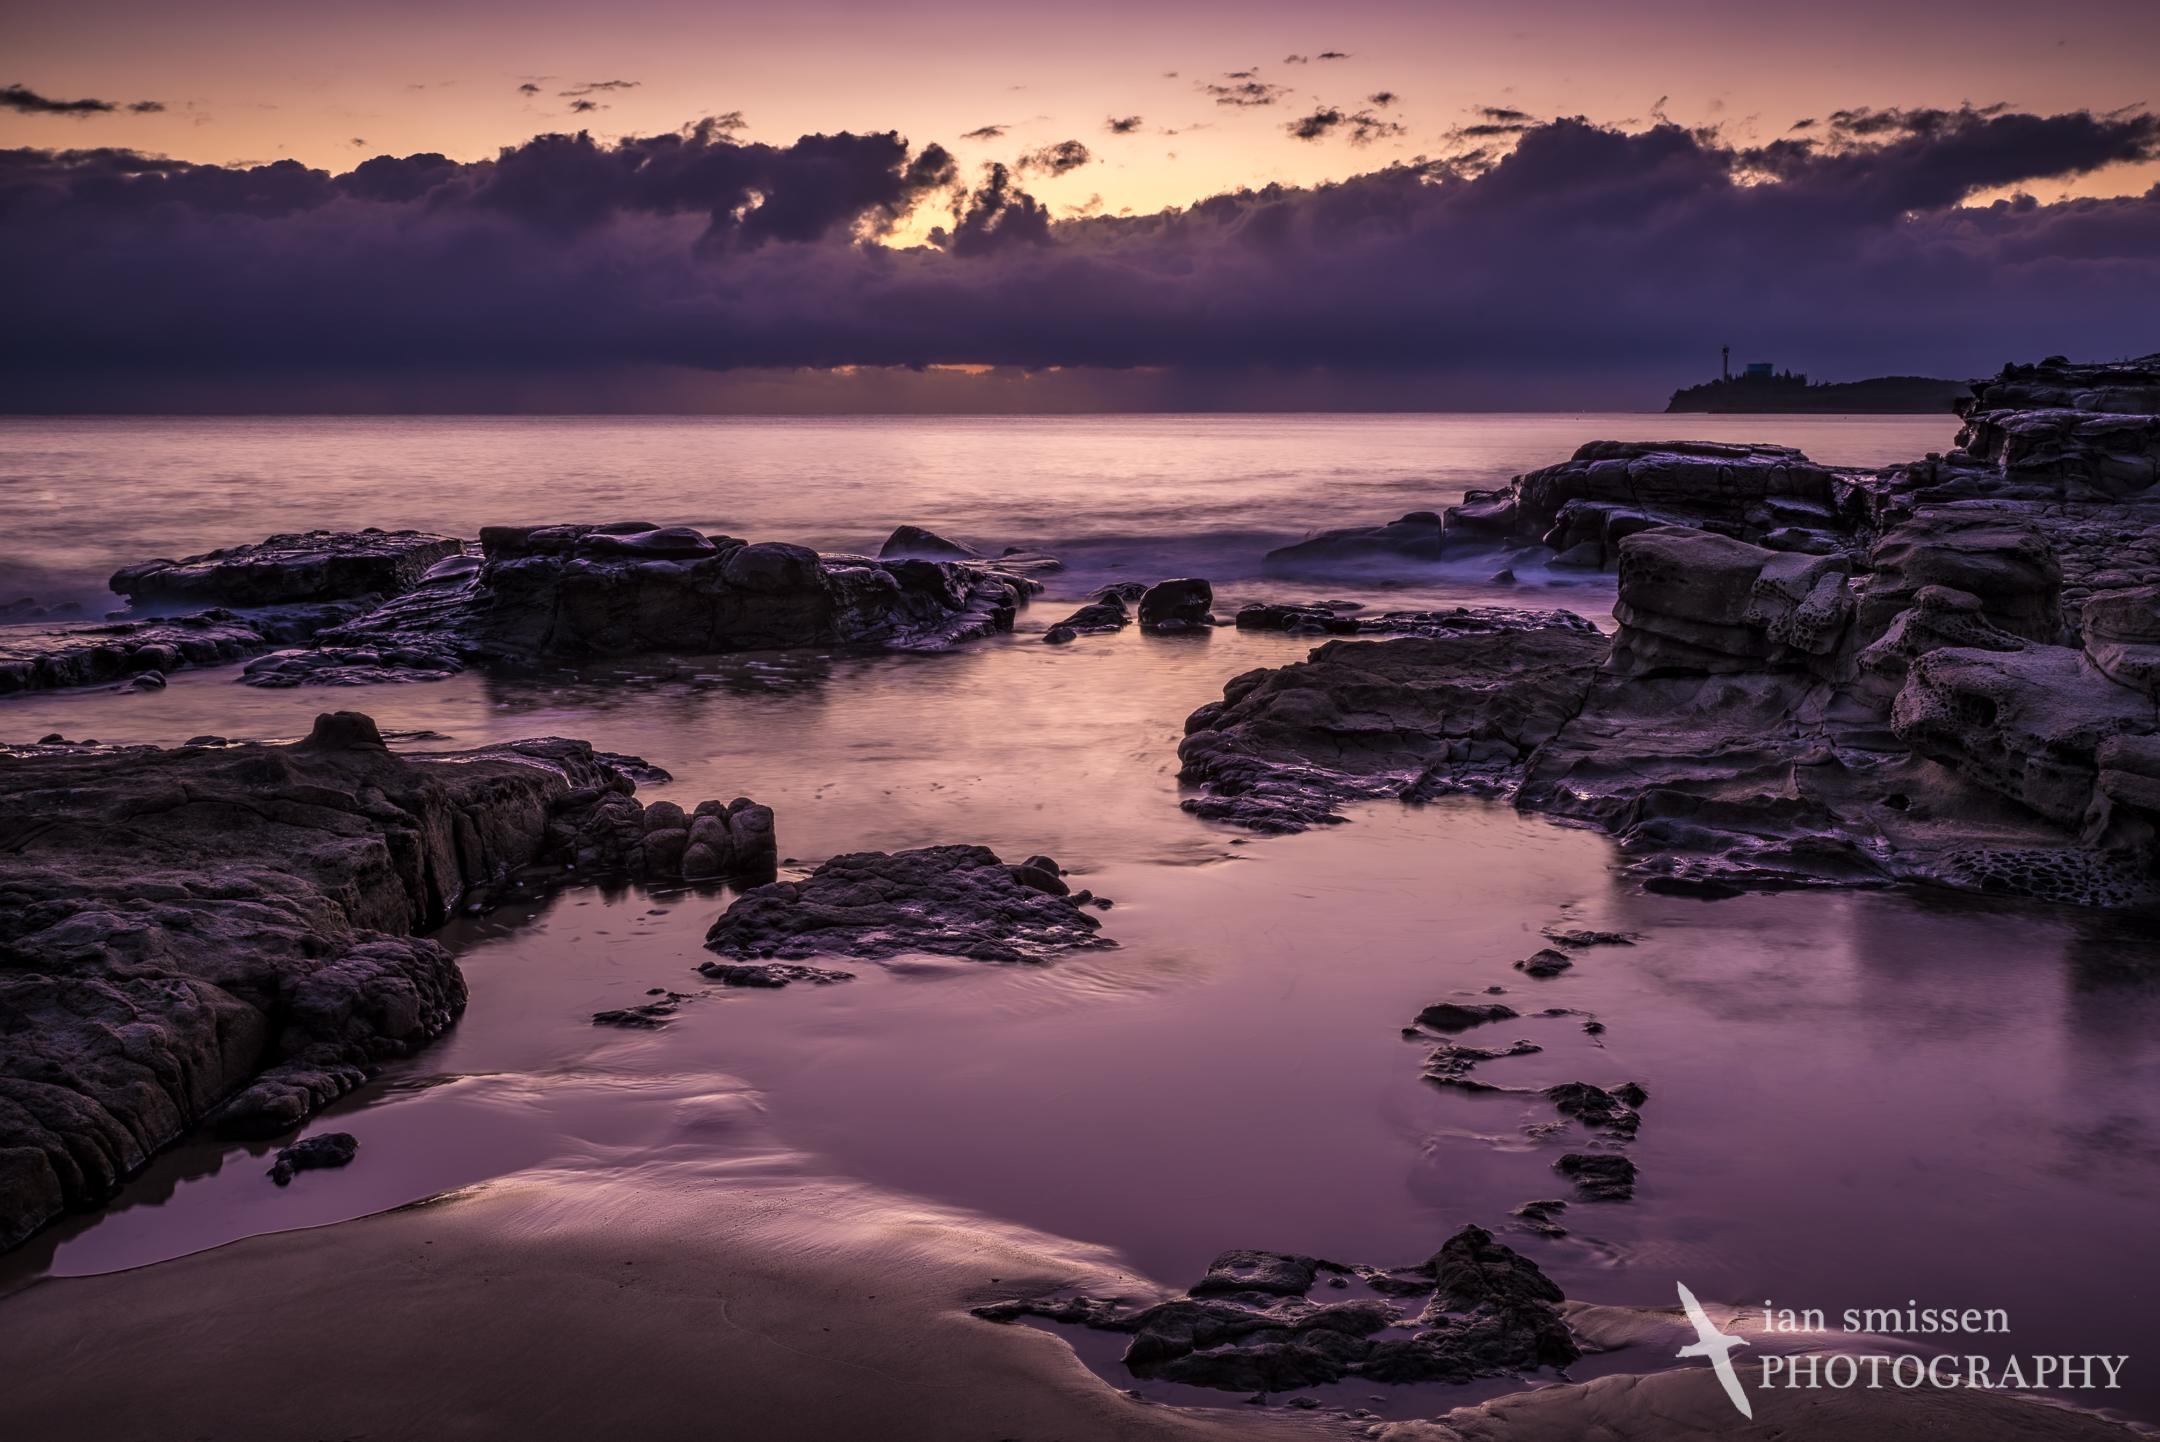 Dawn breaking at Mooloolaba Beach